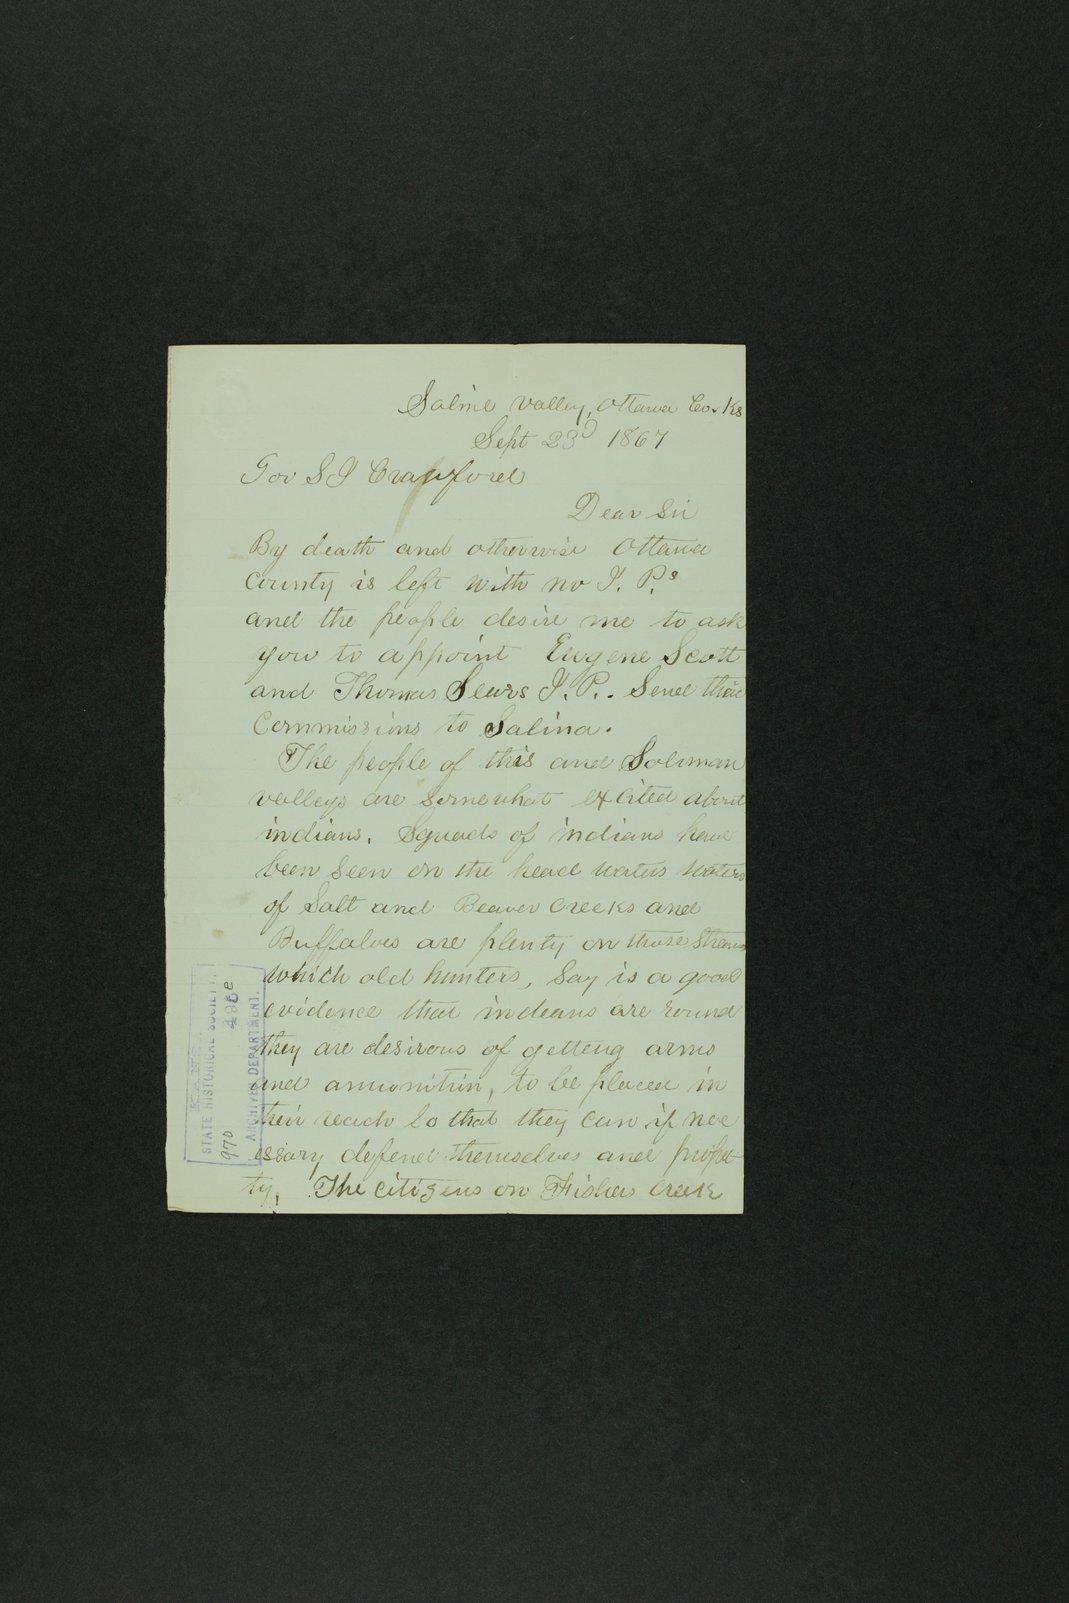 Governor Crawford Indian correspondence - 2